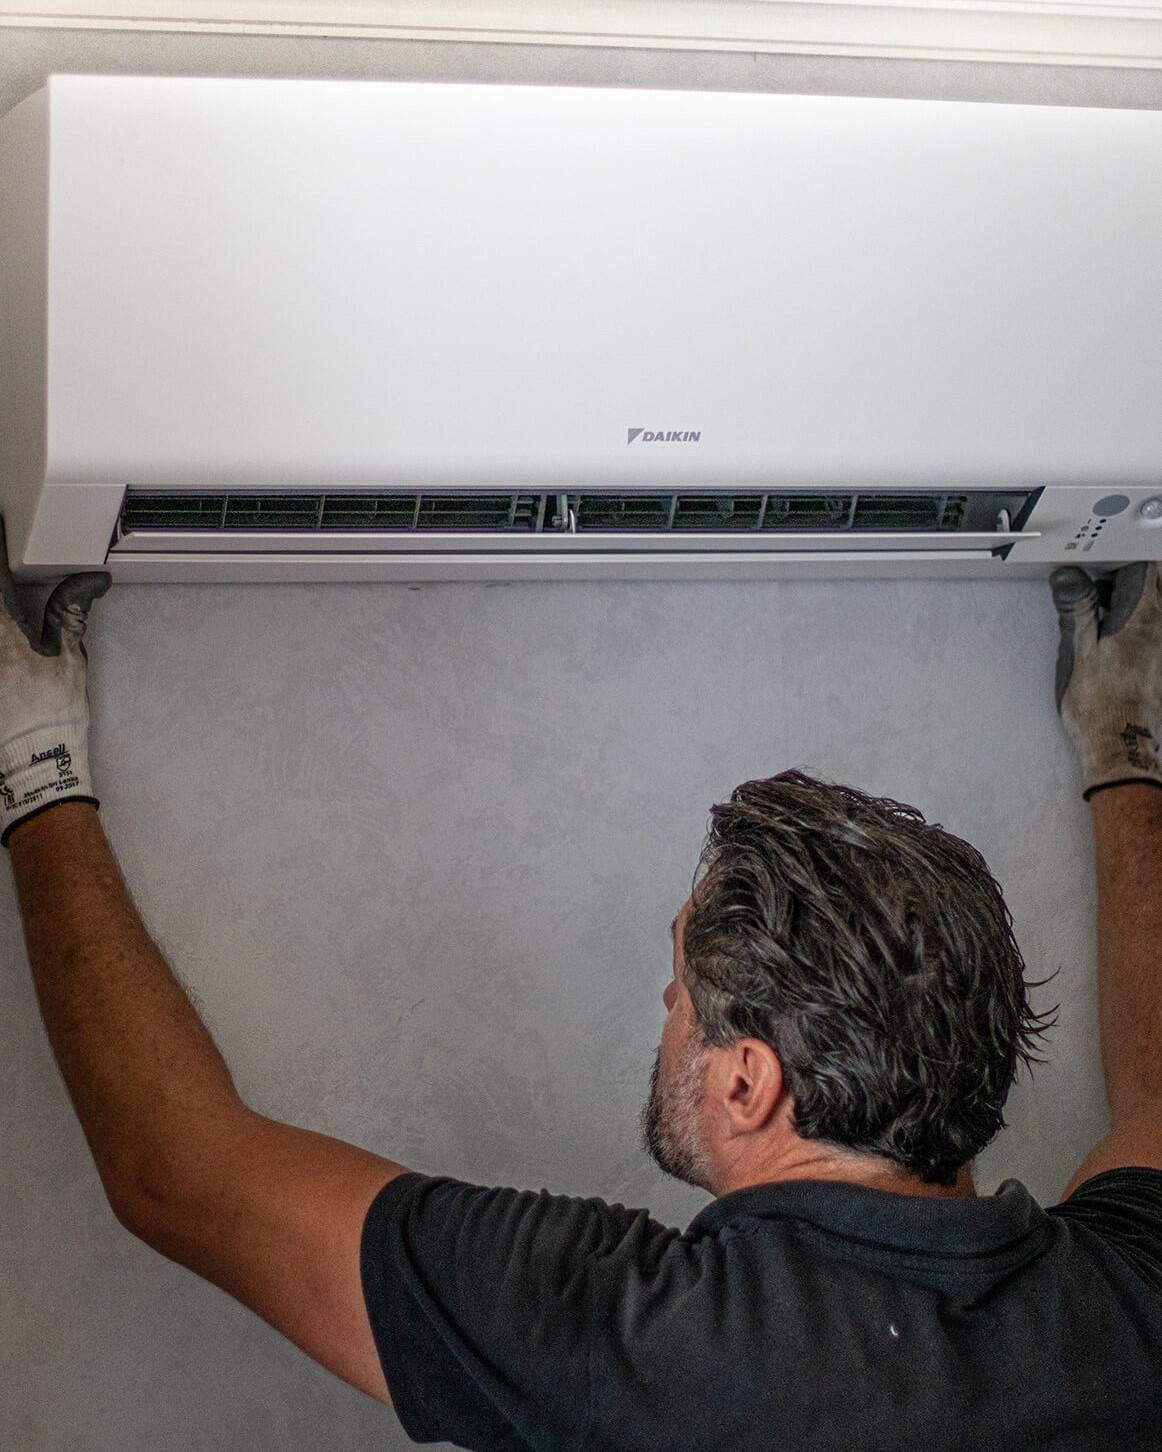 Airco installateur houdt airco unit omhoog tegen de muur om correct te positioneren.